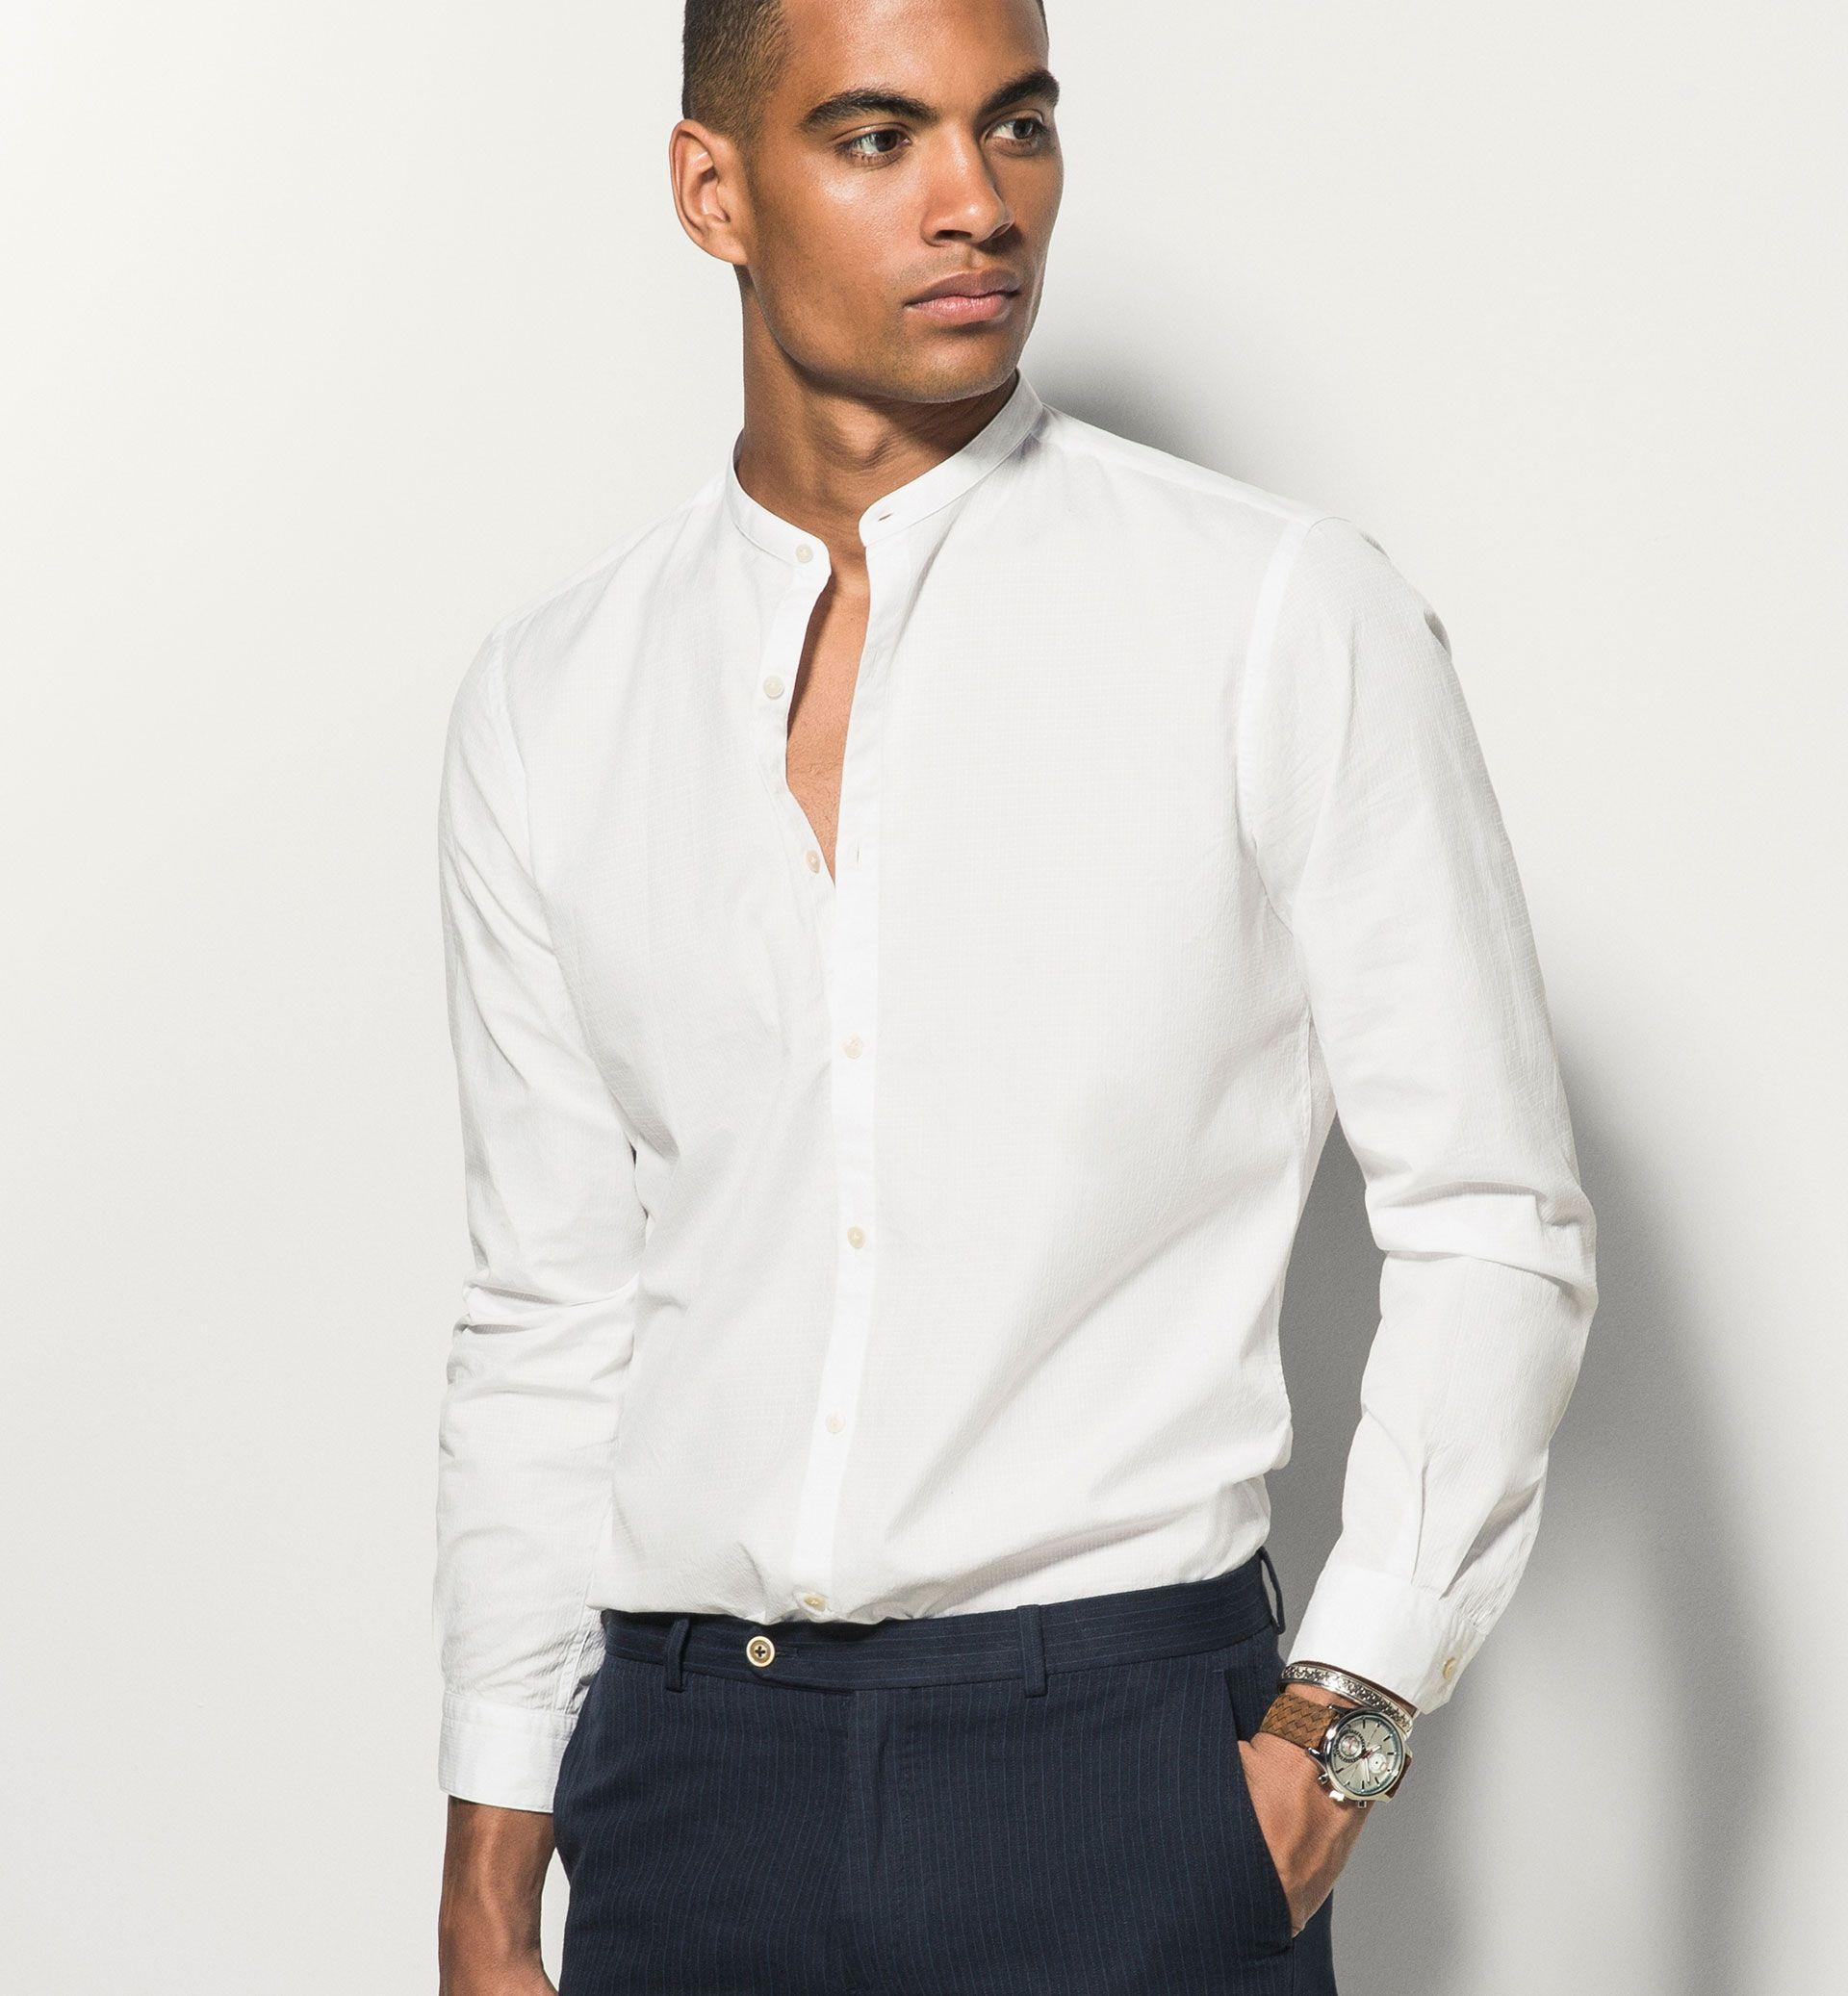 chemise blanche col mao slim chemises white shirt. Black Bedroom Furniture Sets. Home Design Ideas